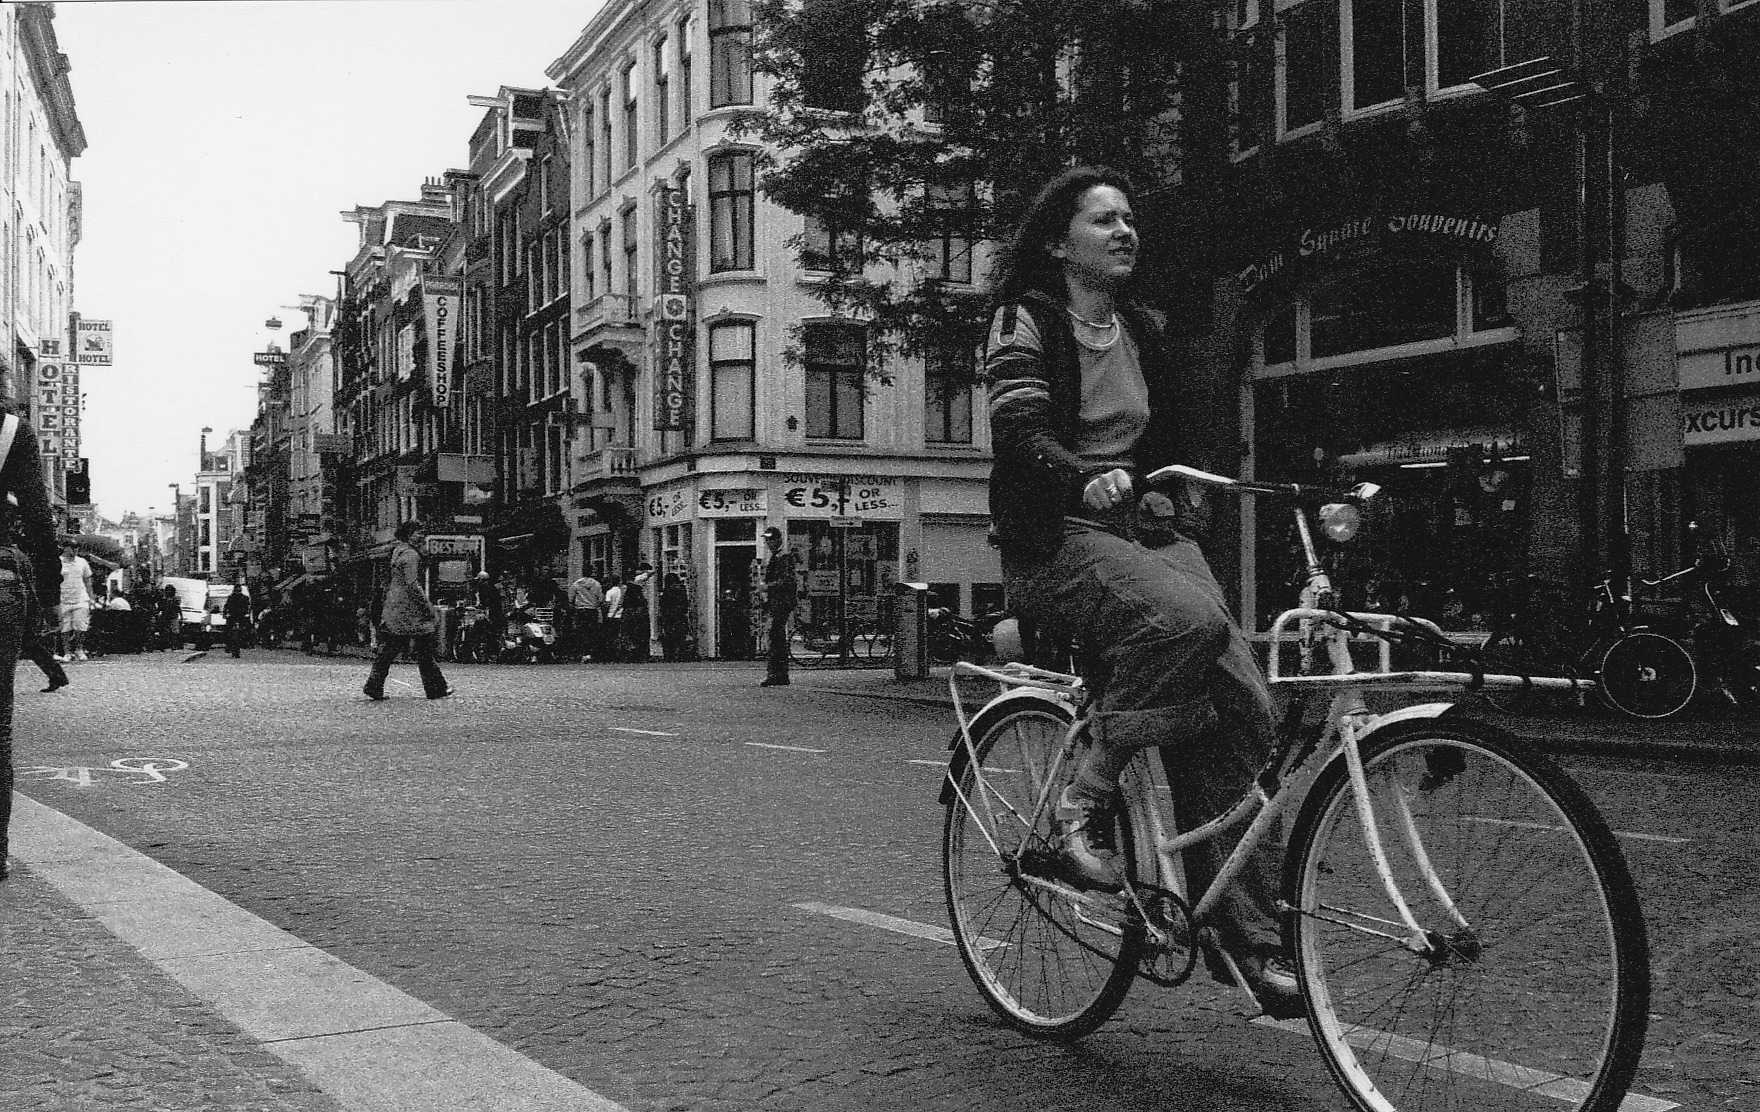 holland2006_0002